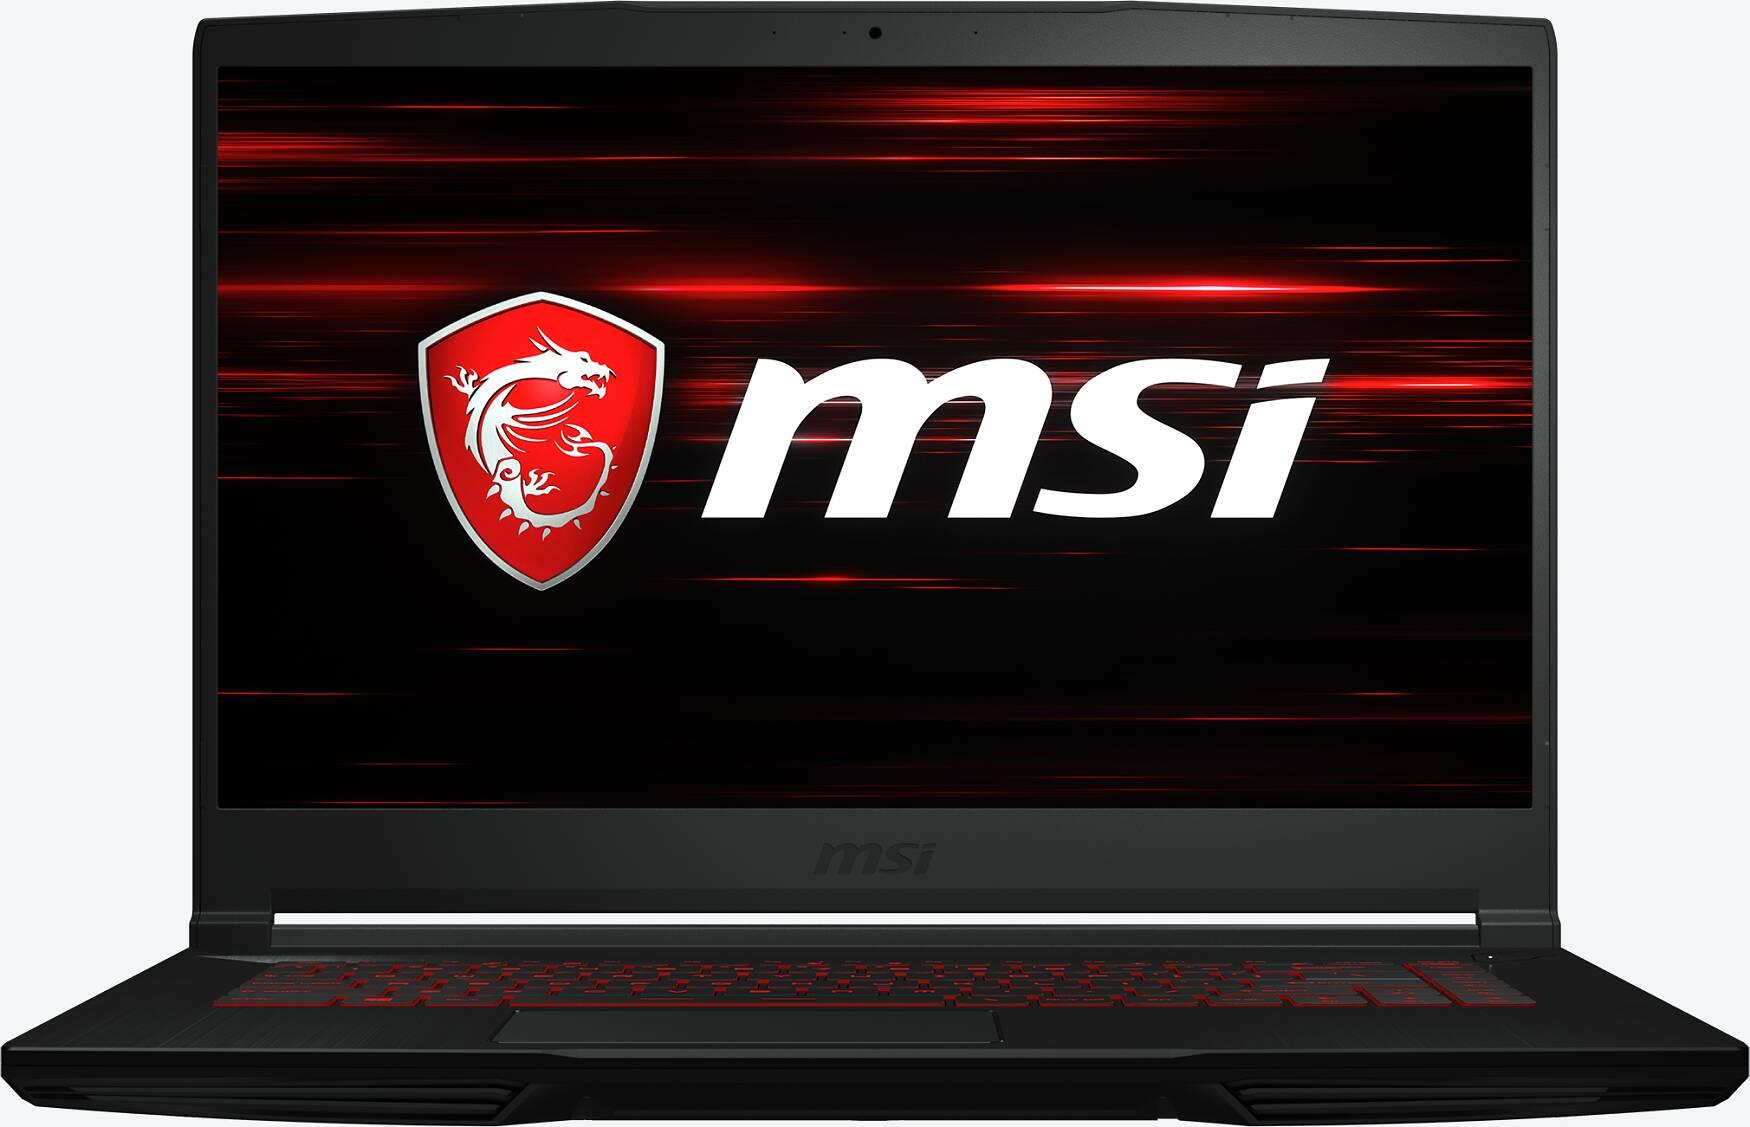 MSI Gaming Series GF63 9SC-836 Thin